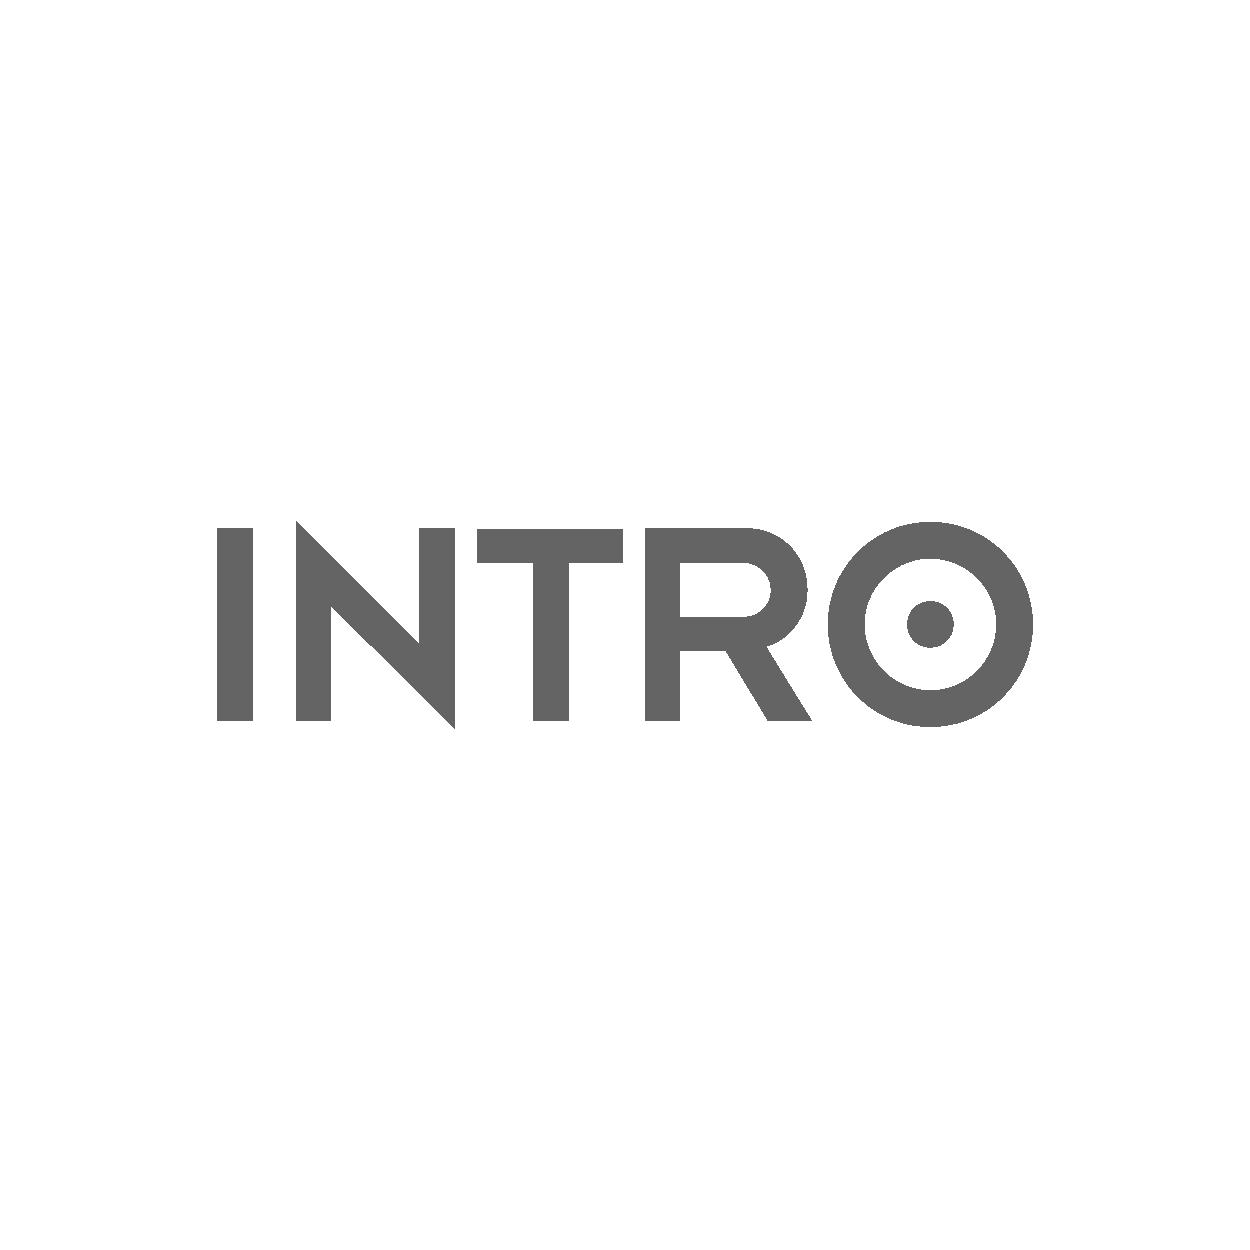 logo_Intro.png